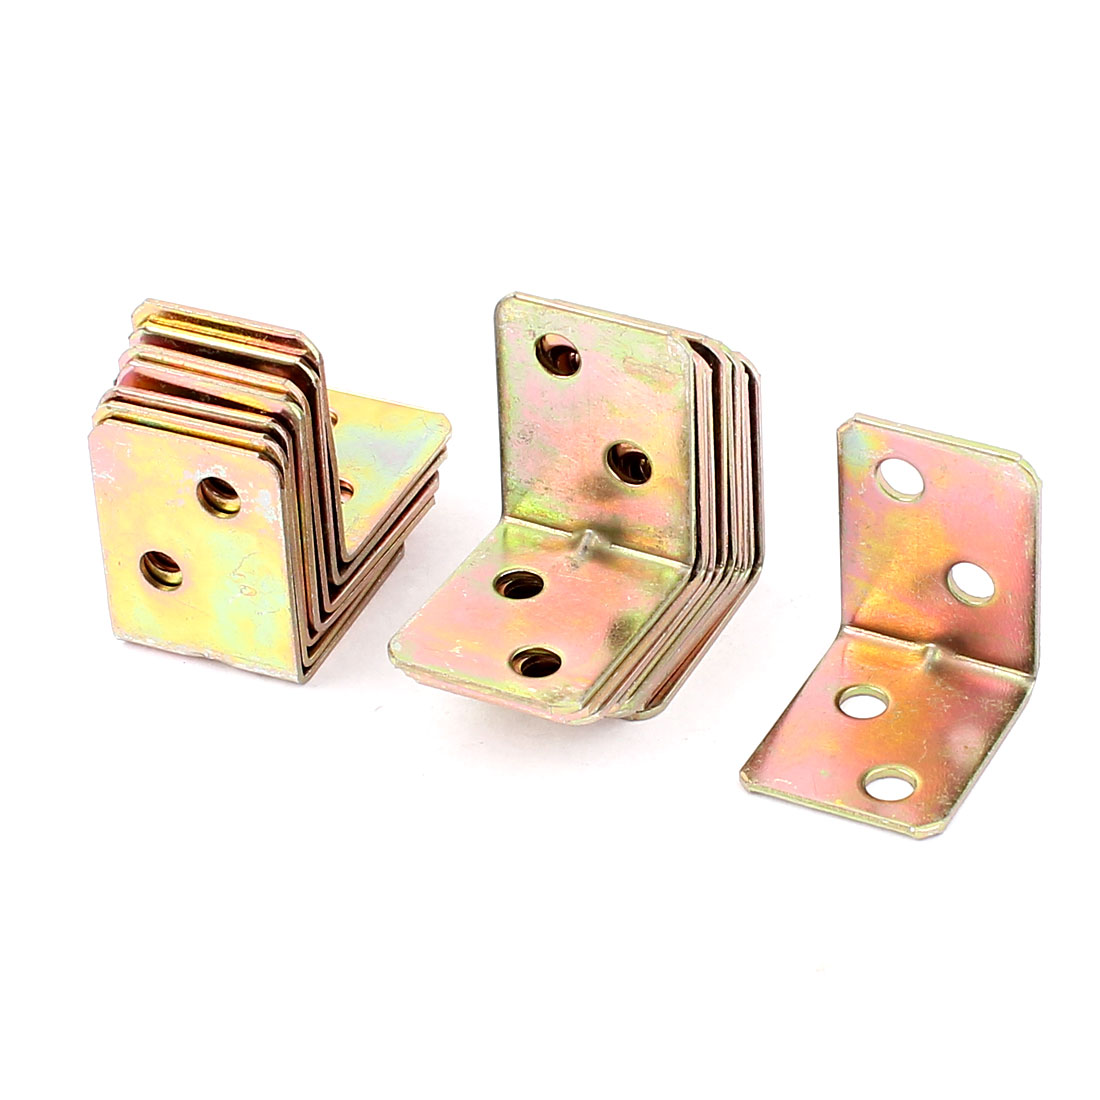 Shelf Support Brace Fastener Plating 4 Holes Metal Angle Brackets 18pcs